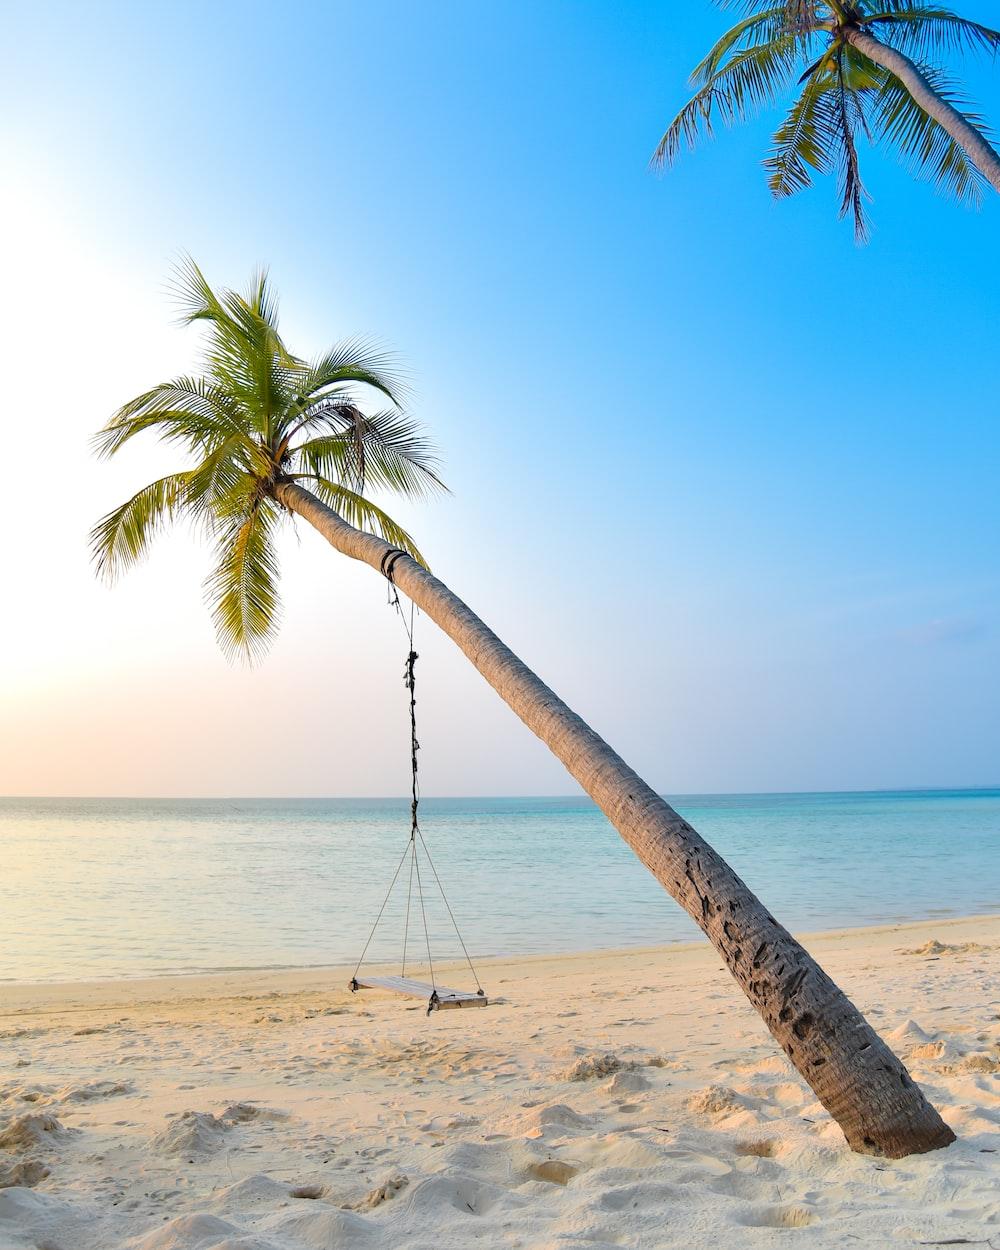 swing hang on coconut tree near seashore